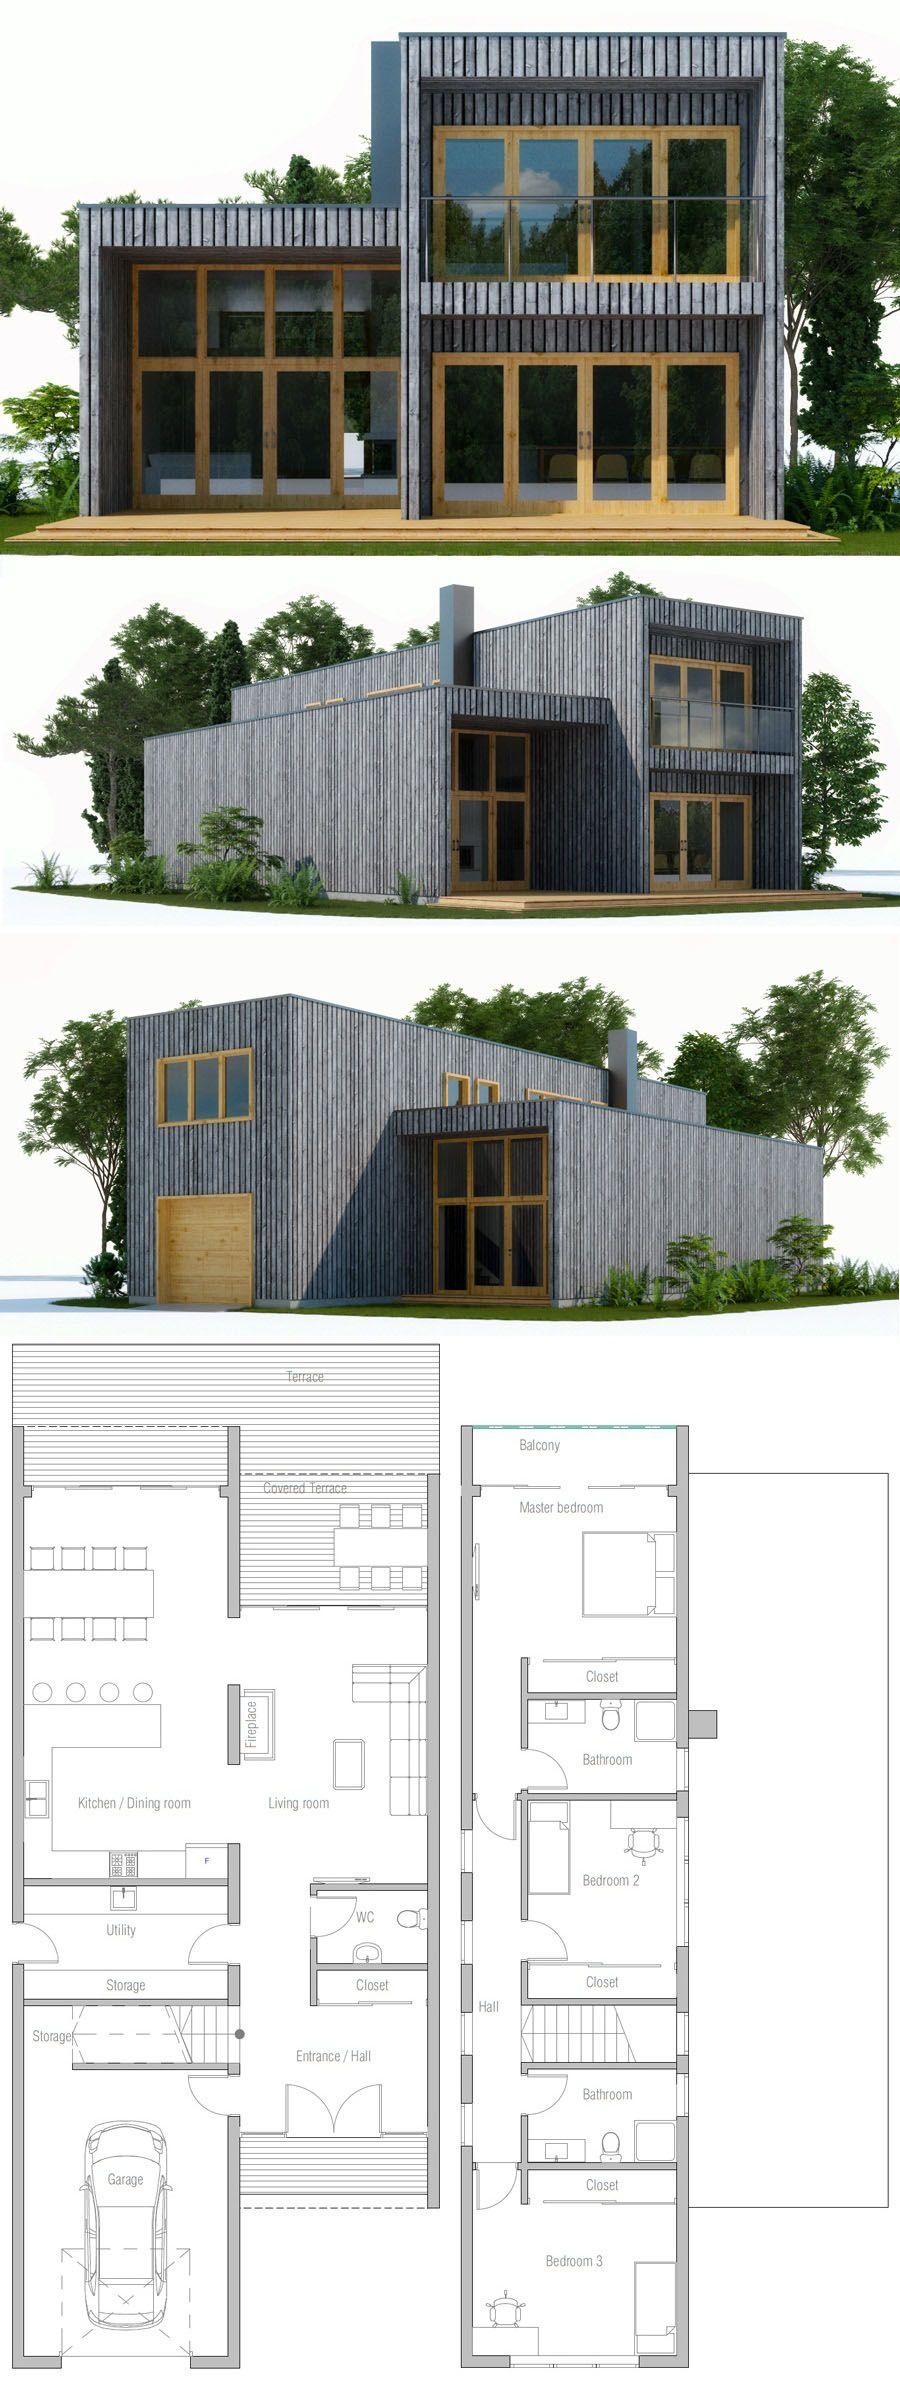 Dream home plans new ideas house also rh pinterest